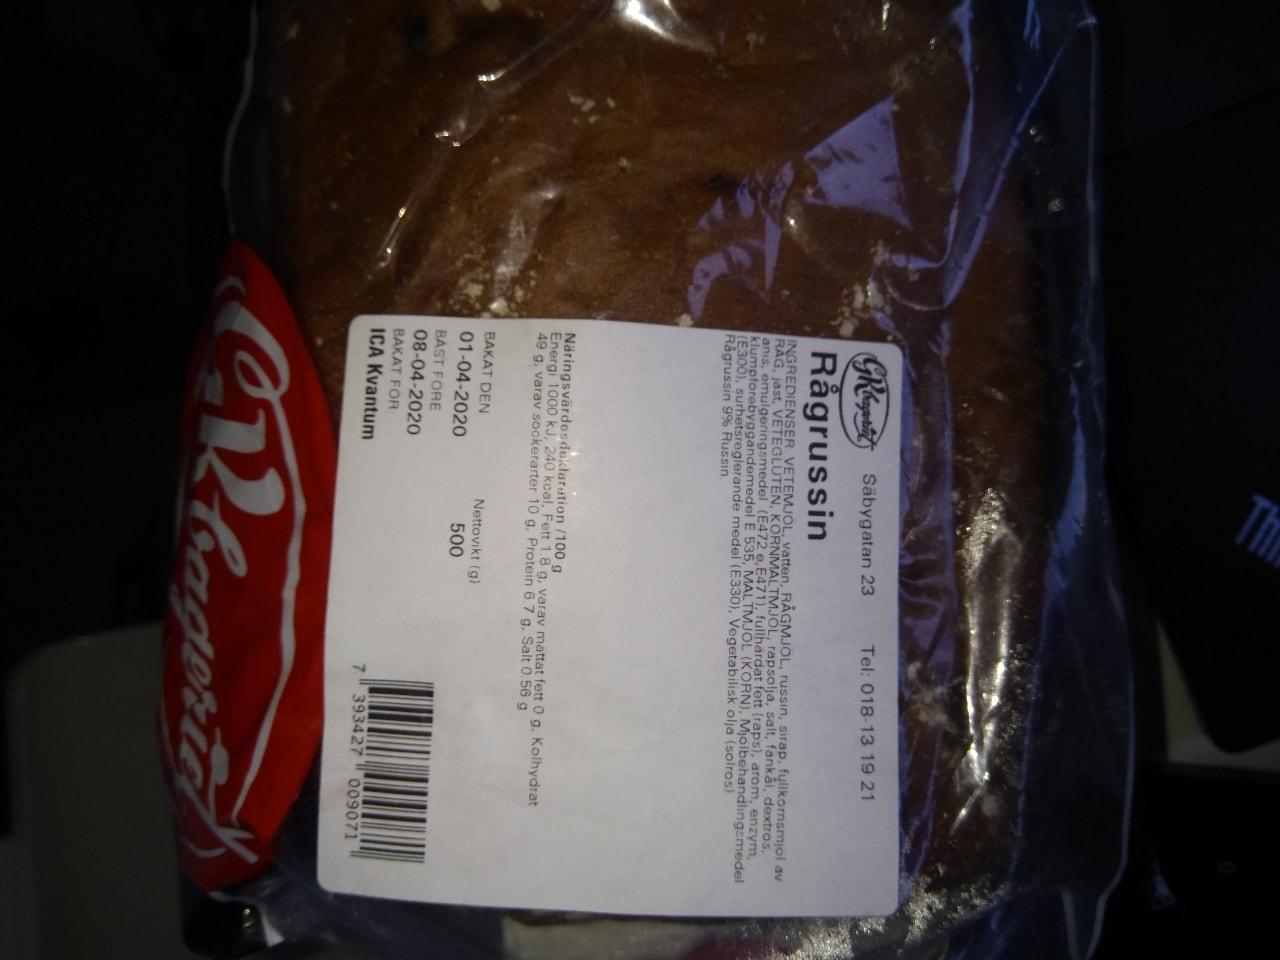 Rasin bread